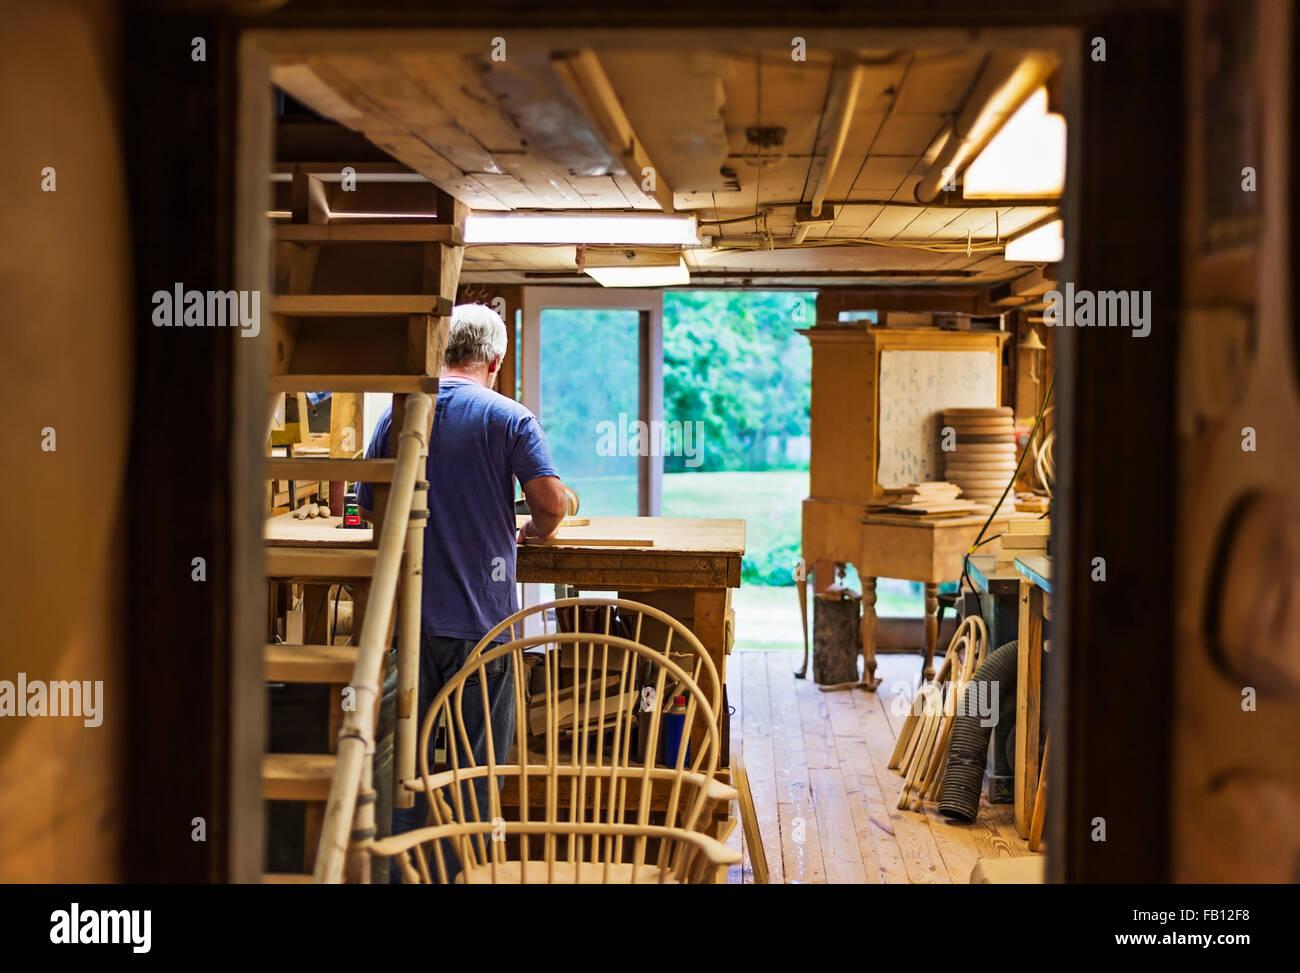 Atelier de menuiserie Photo Stock